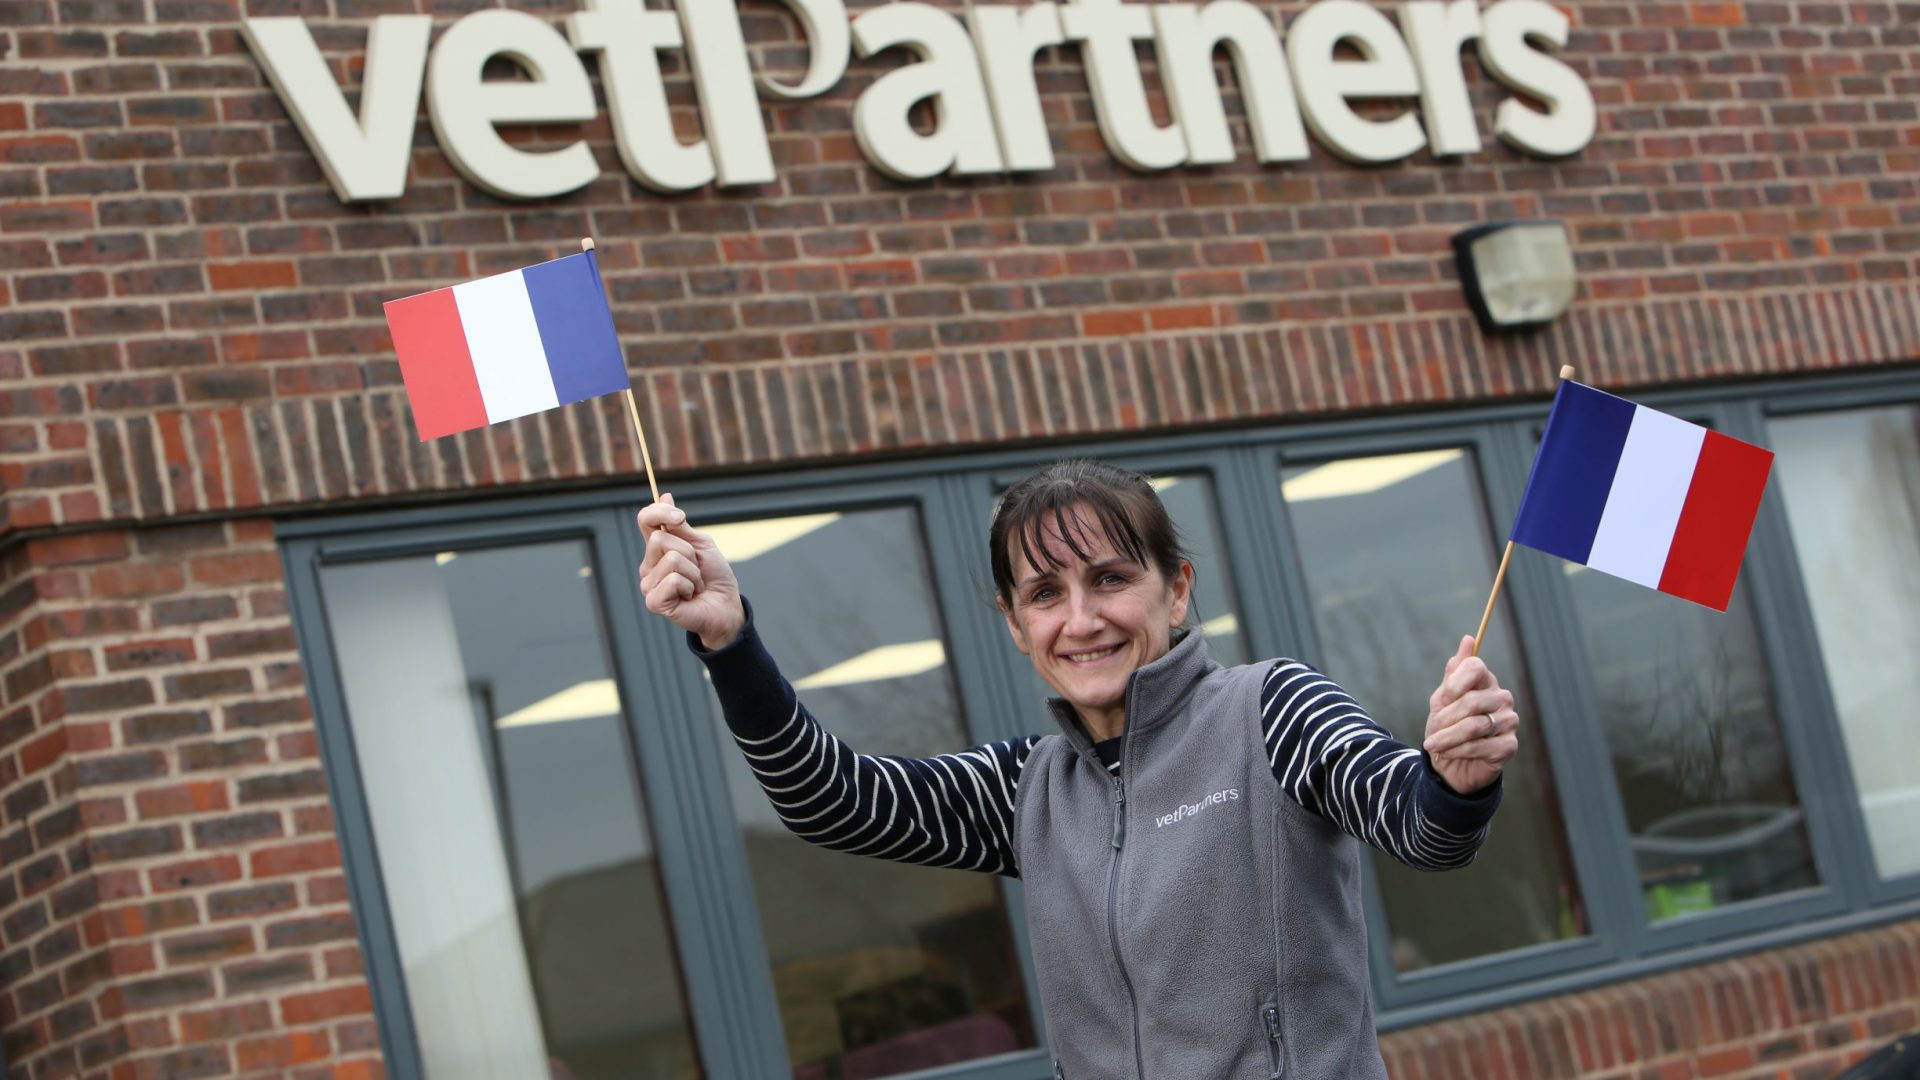 VetPartners says bonjour to France